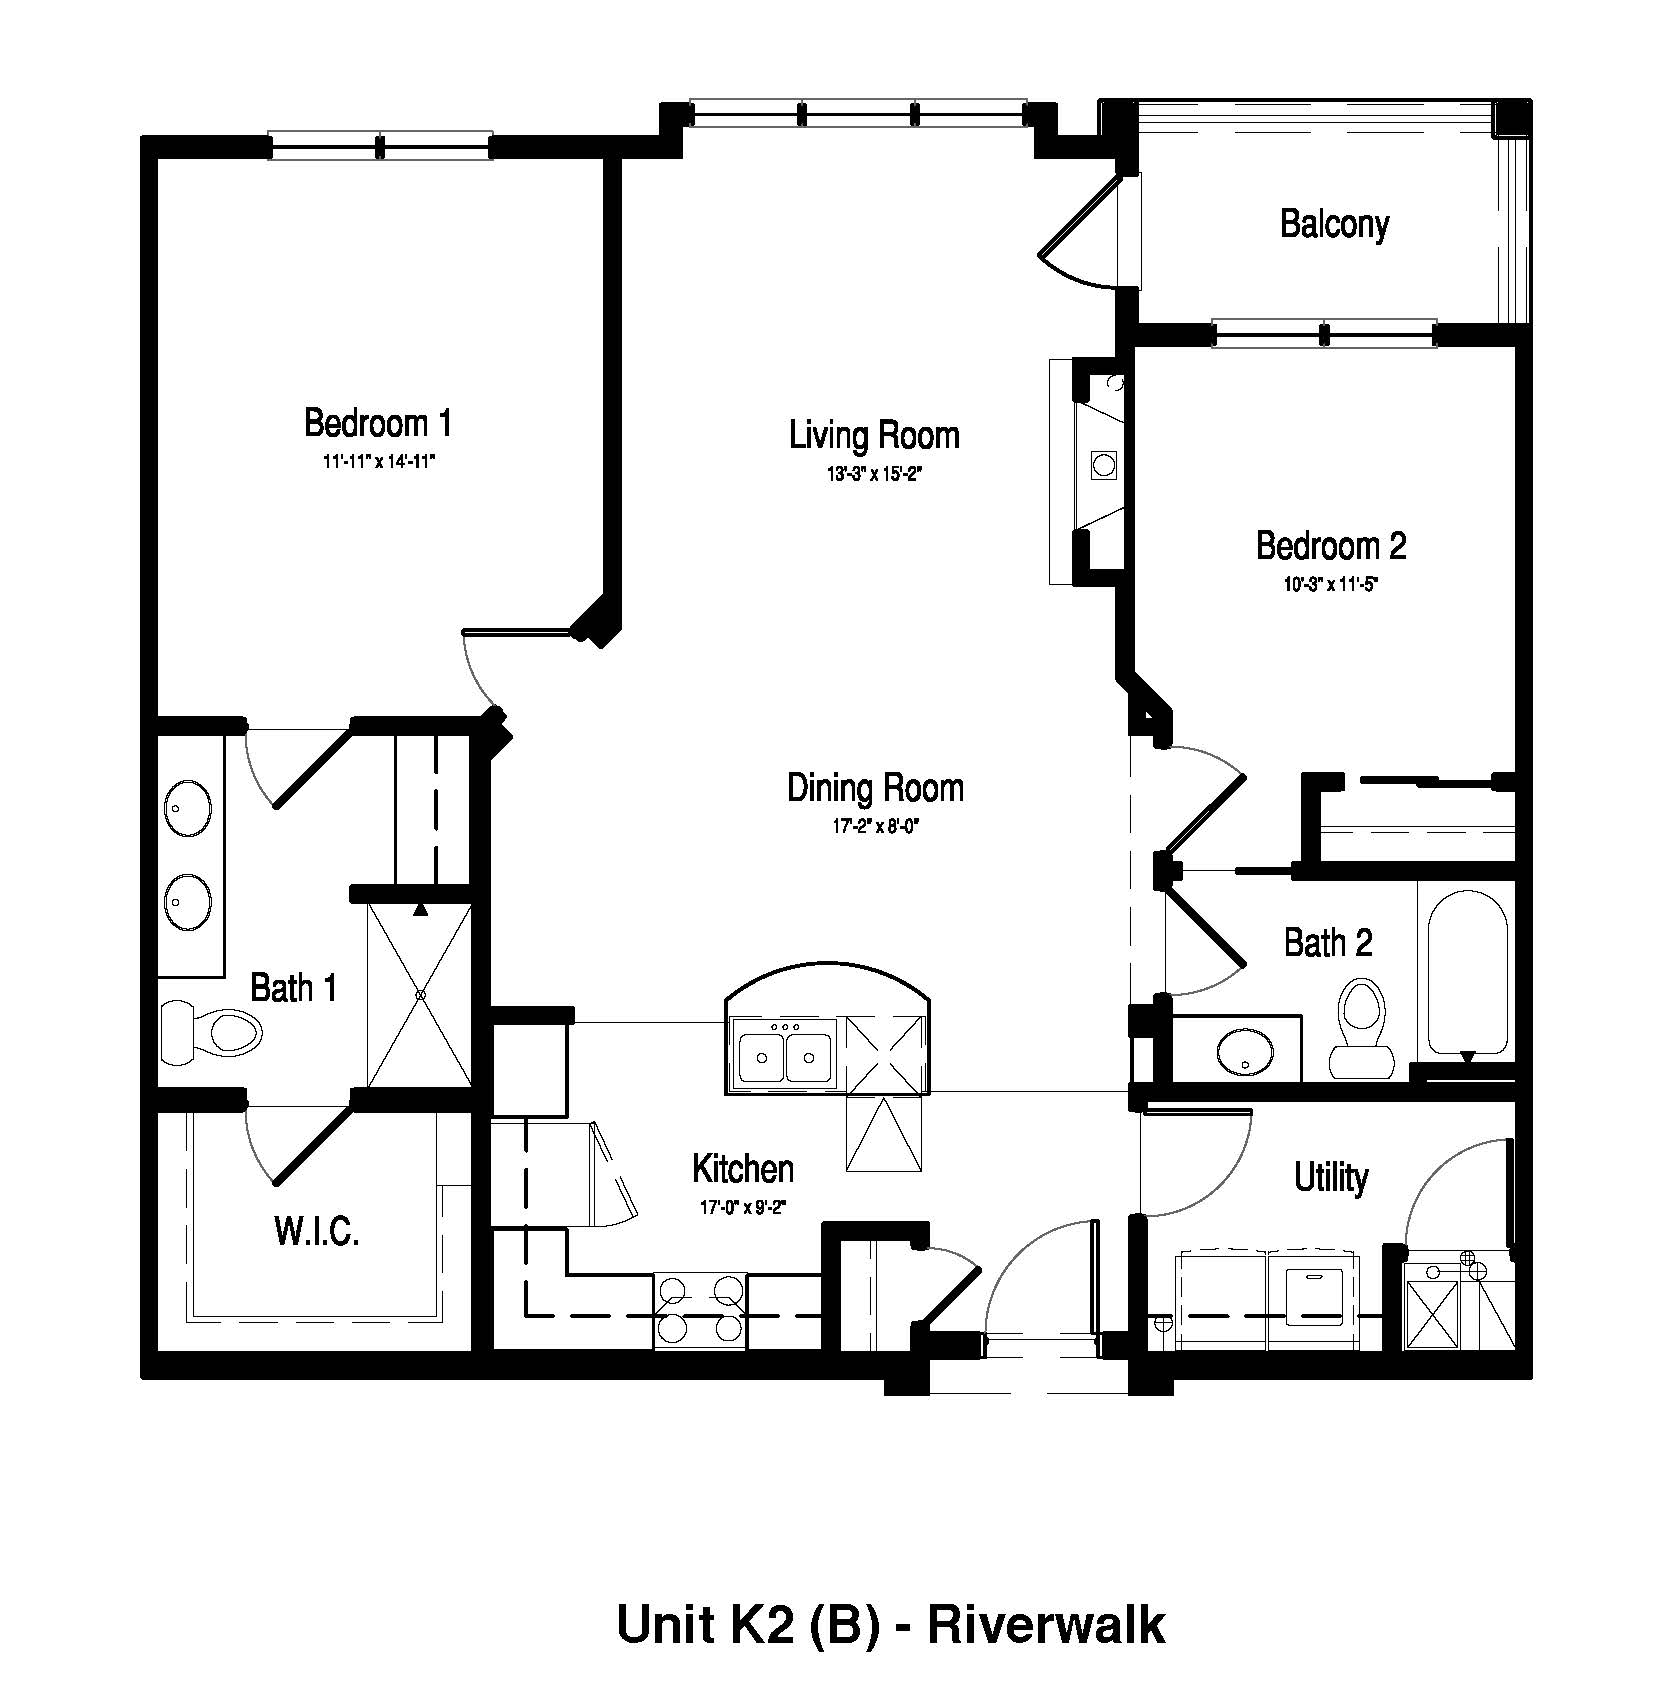 Wiring Diagram For A Bonus Room